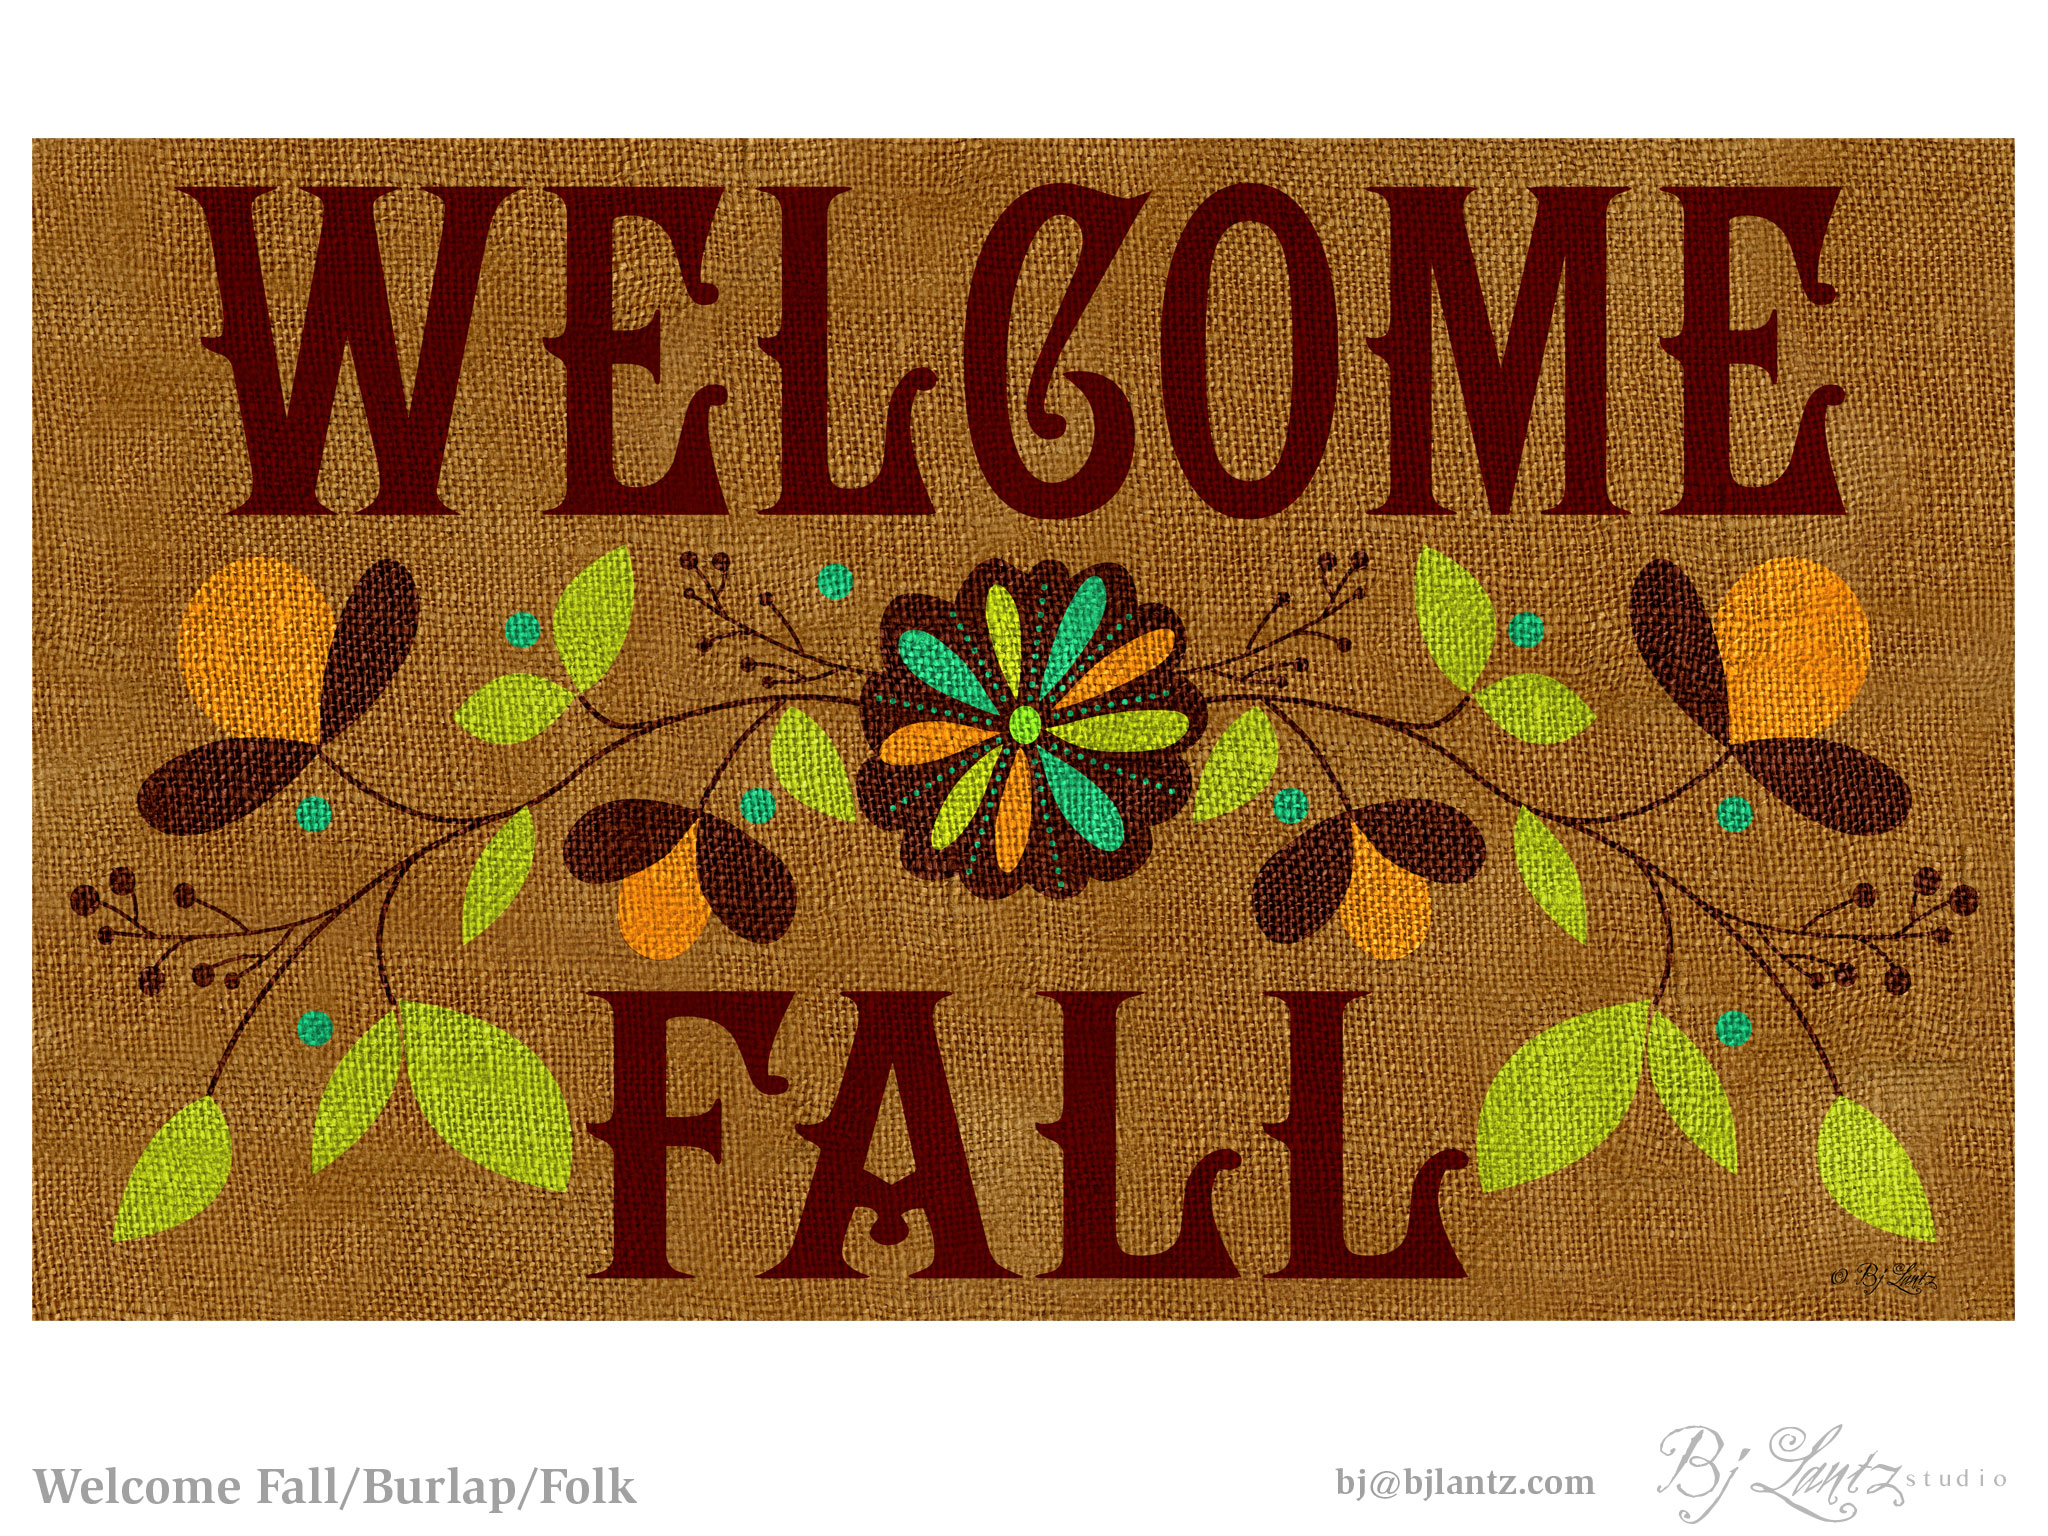 WelcomeFallBurlap_BJLantz_1.jpg